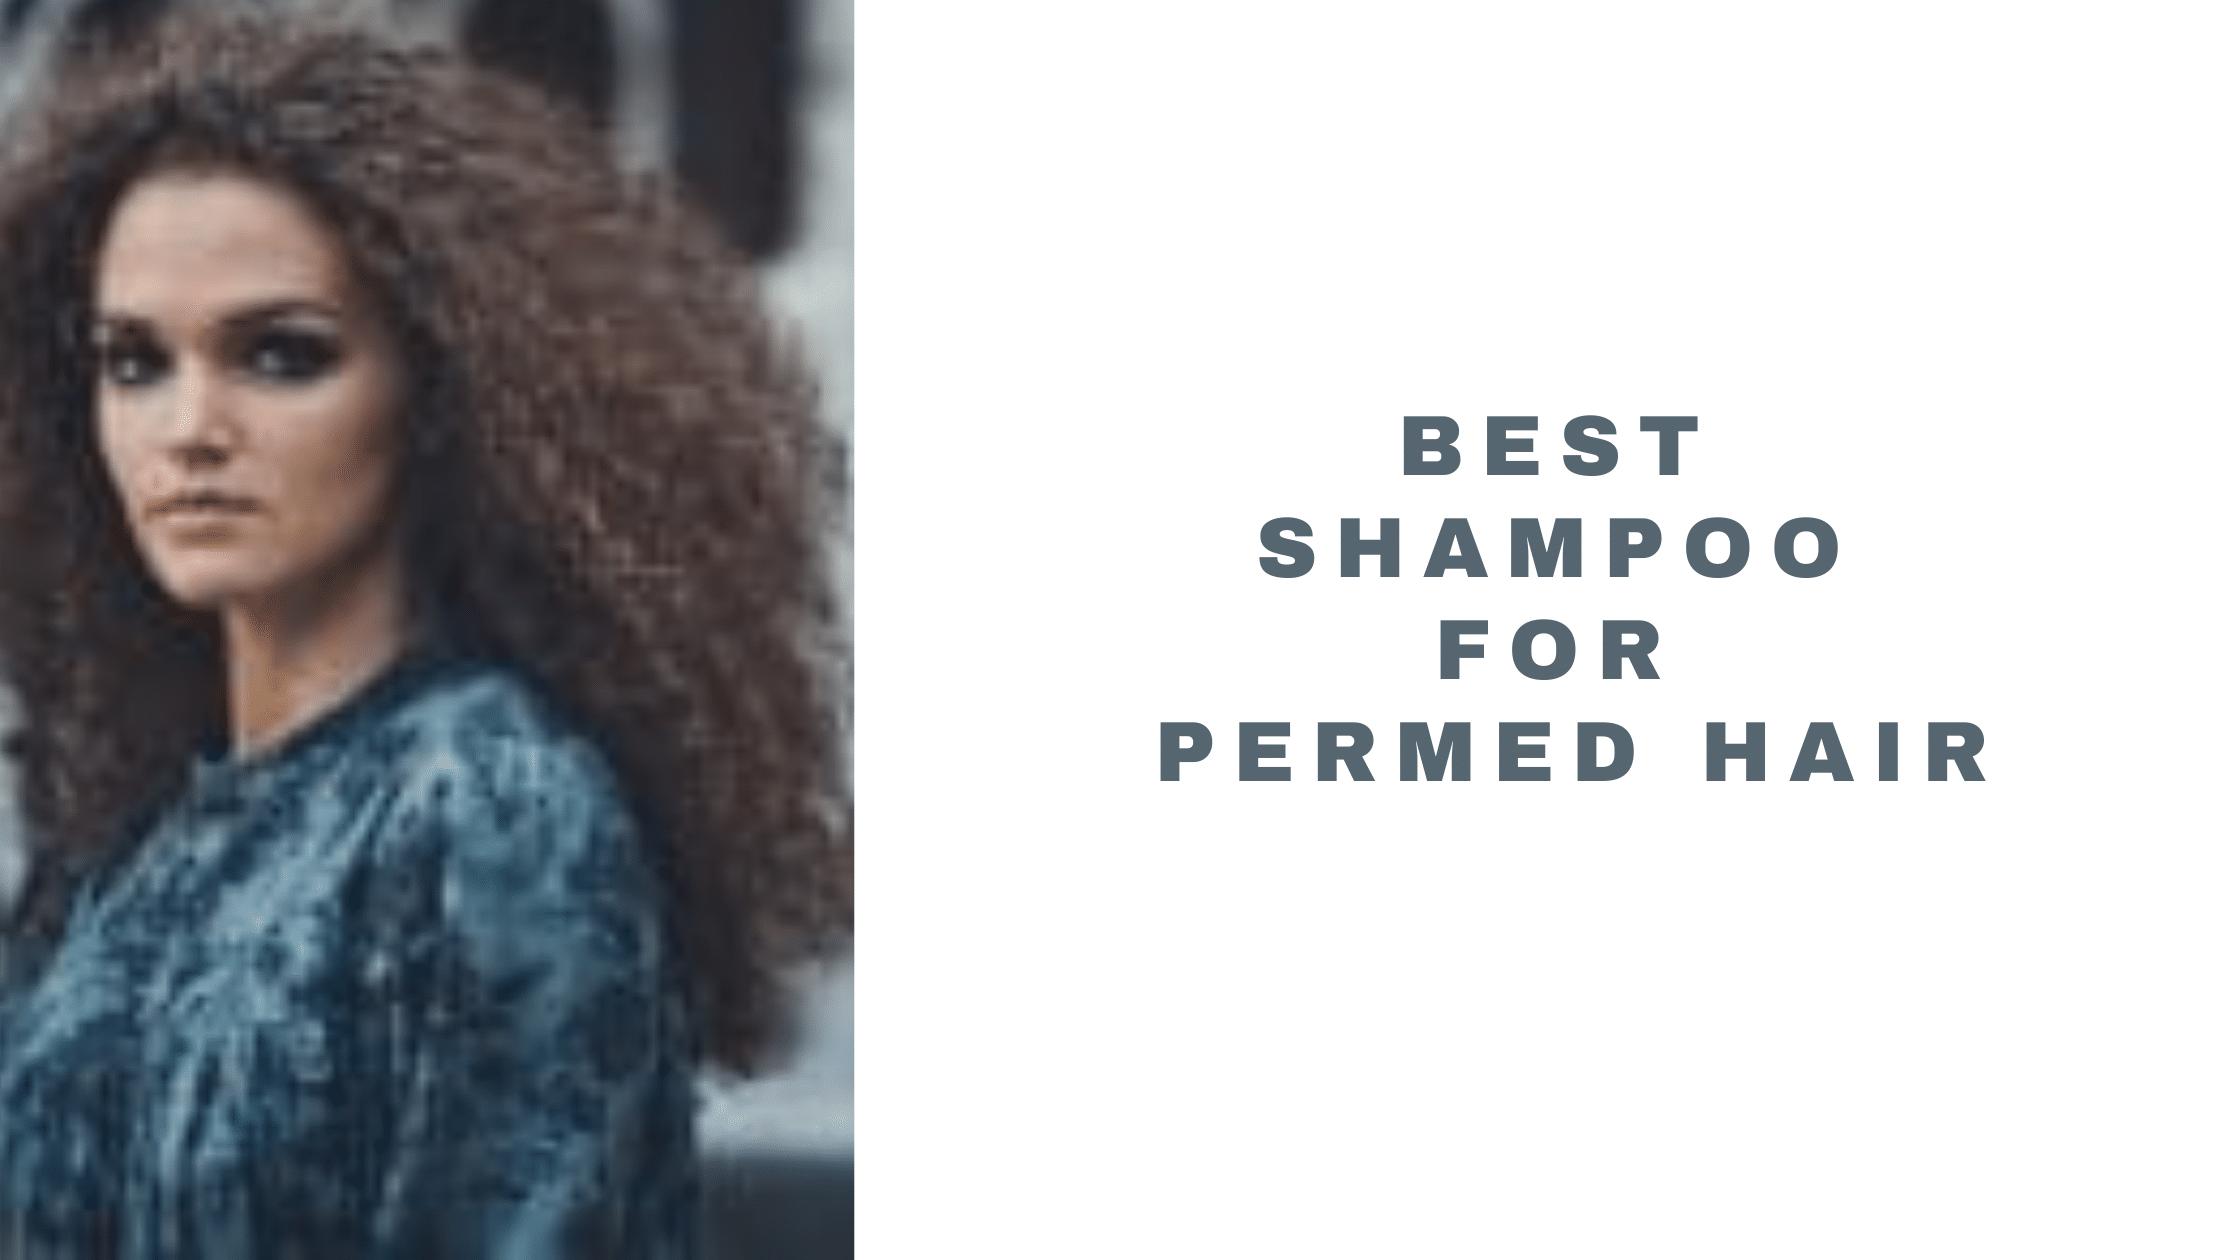 10 Best Shampoo For Permed Hair 2021